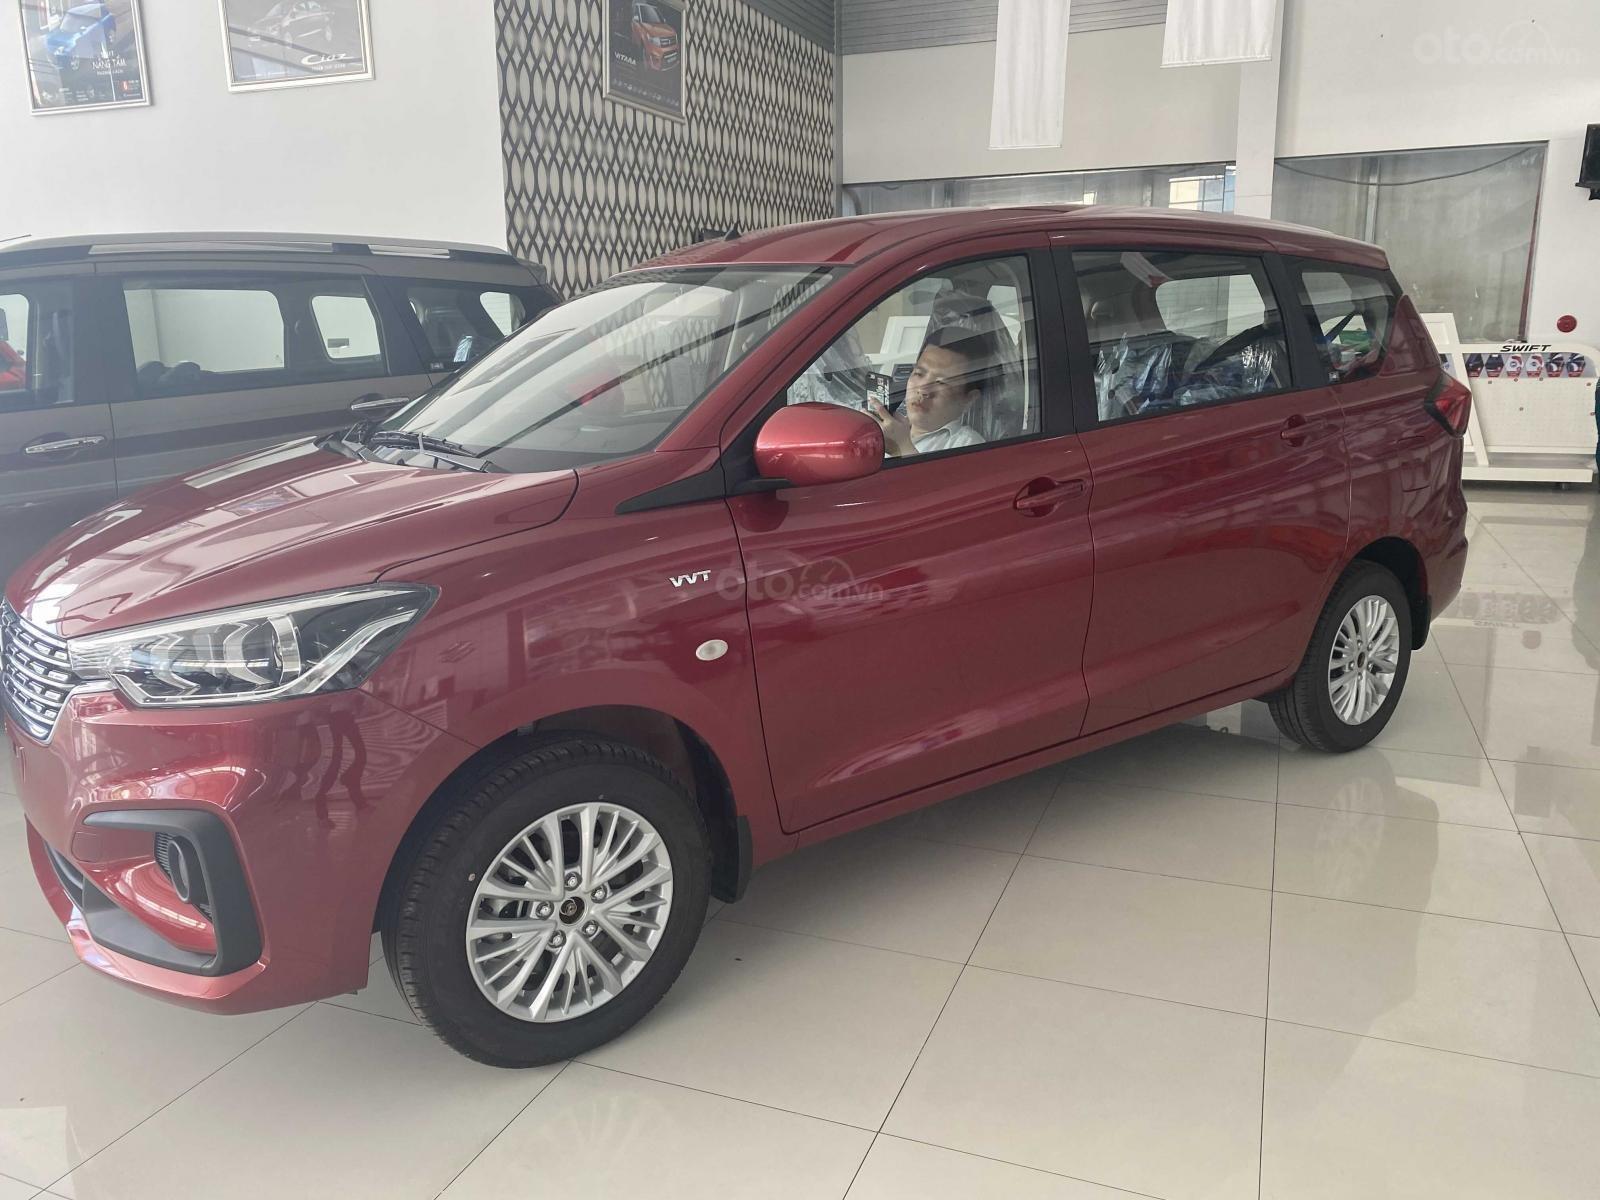 Suzuki Ertiga 2020 phiên bản GL, giá sốc chỉ cần 100tr lăn bánh (2)